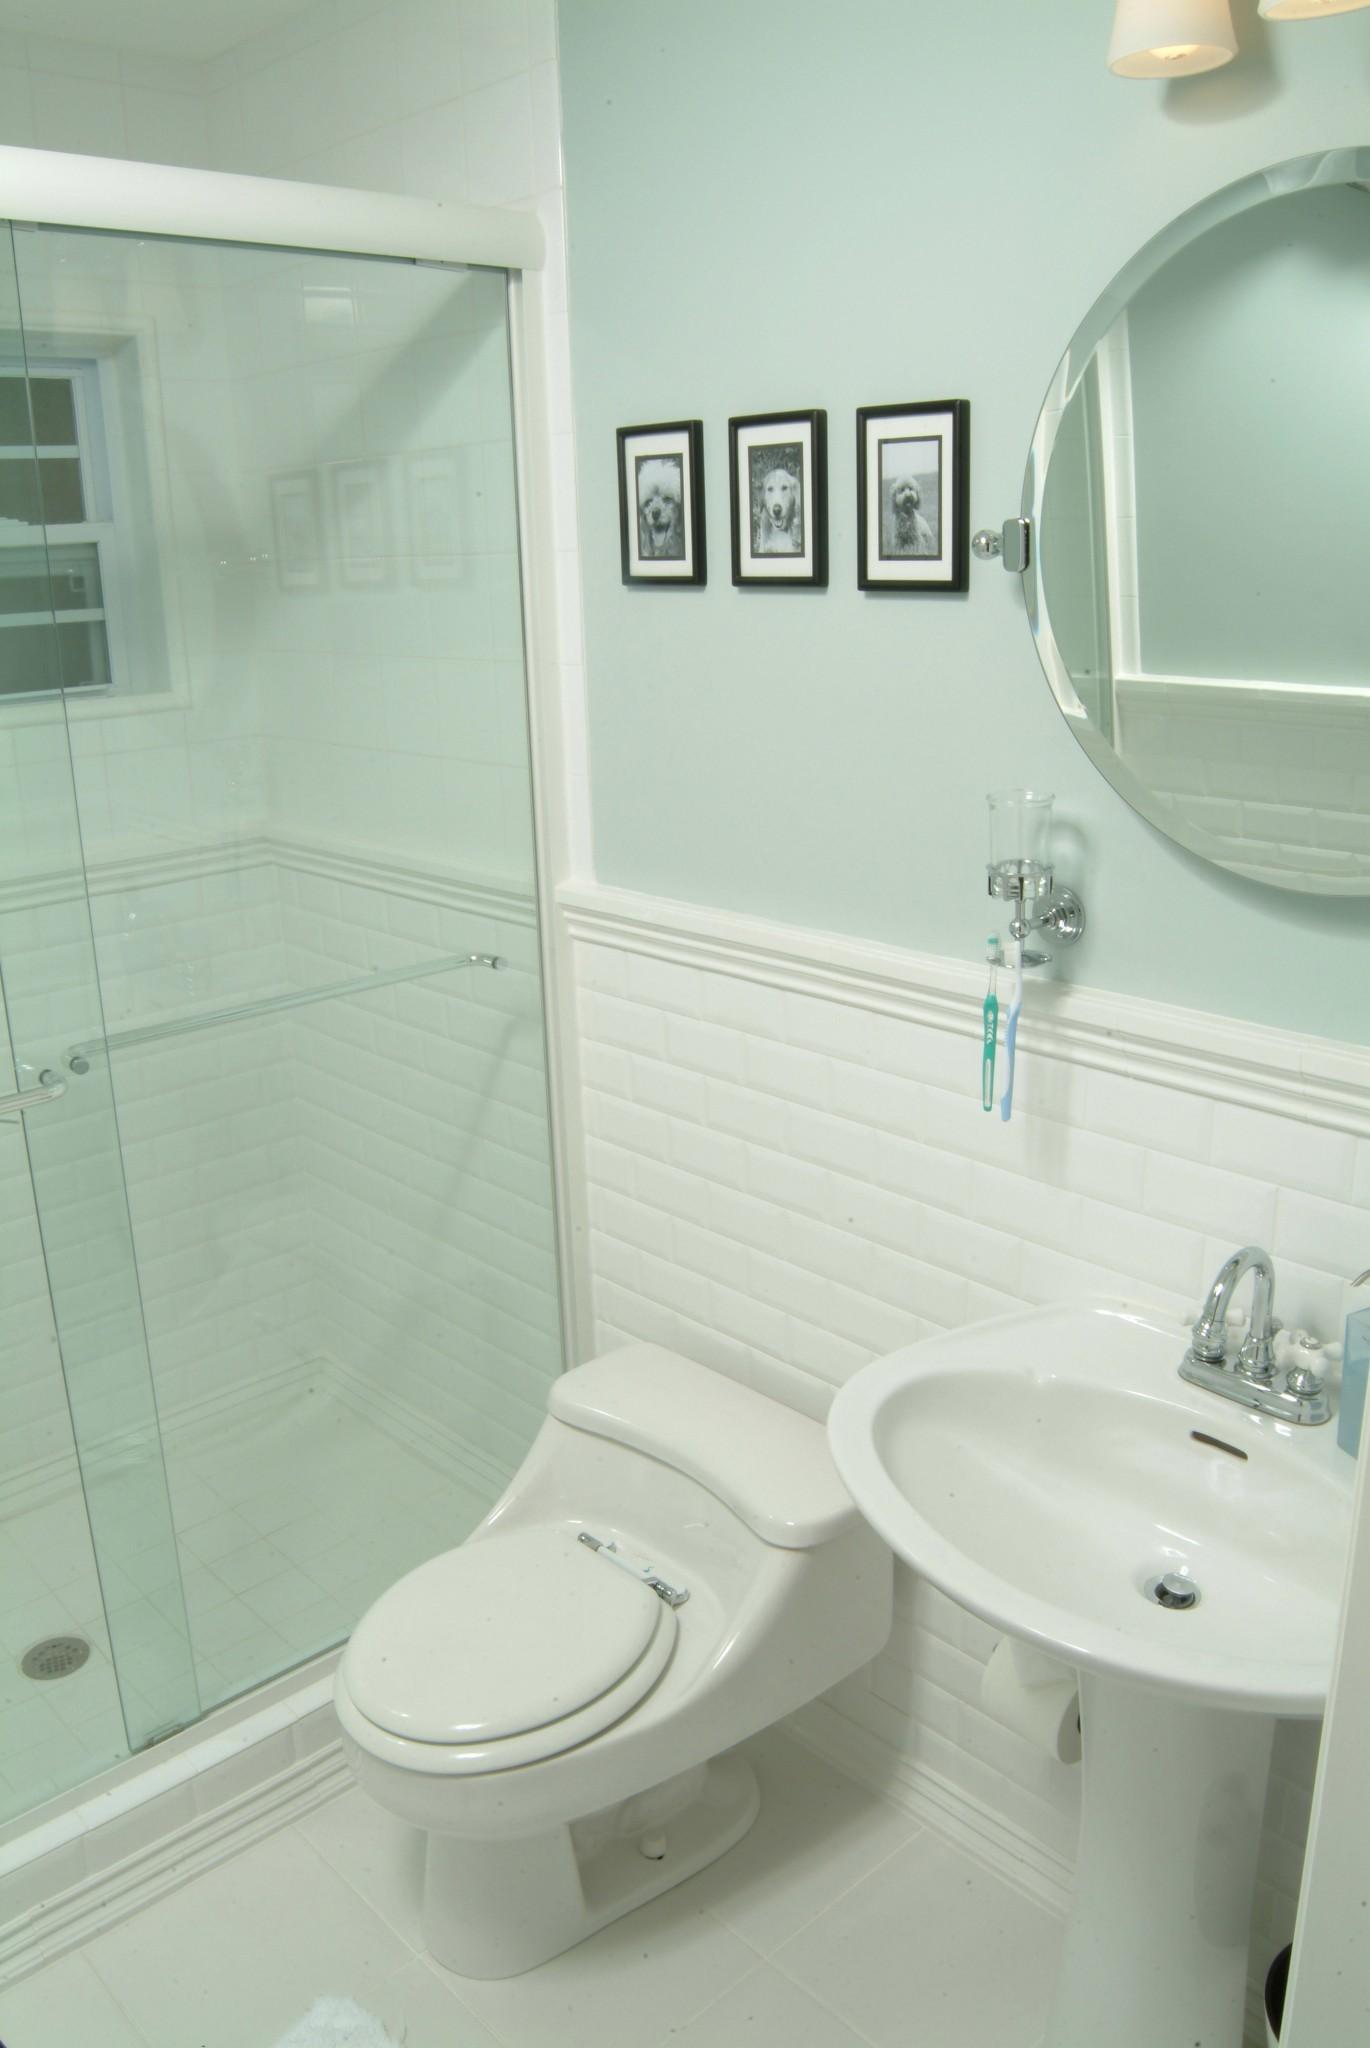 transitional guest hallway bathroom with white subway tile wainscot, light blue walls, pedestal ADA sink , tilt mirror, chrome fixtures, glass shower enclosure, and layered lighting plan